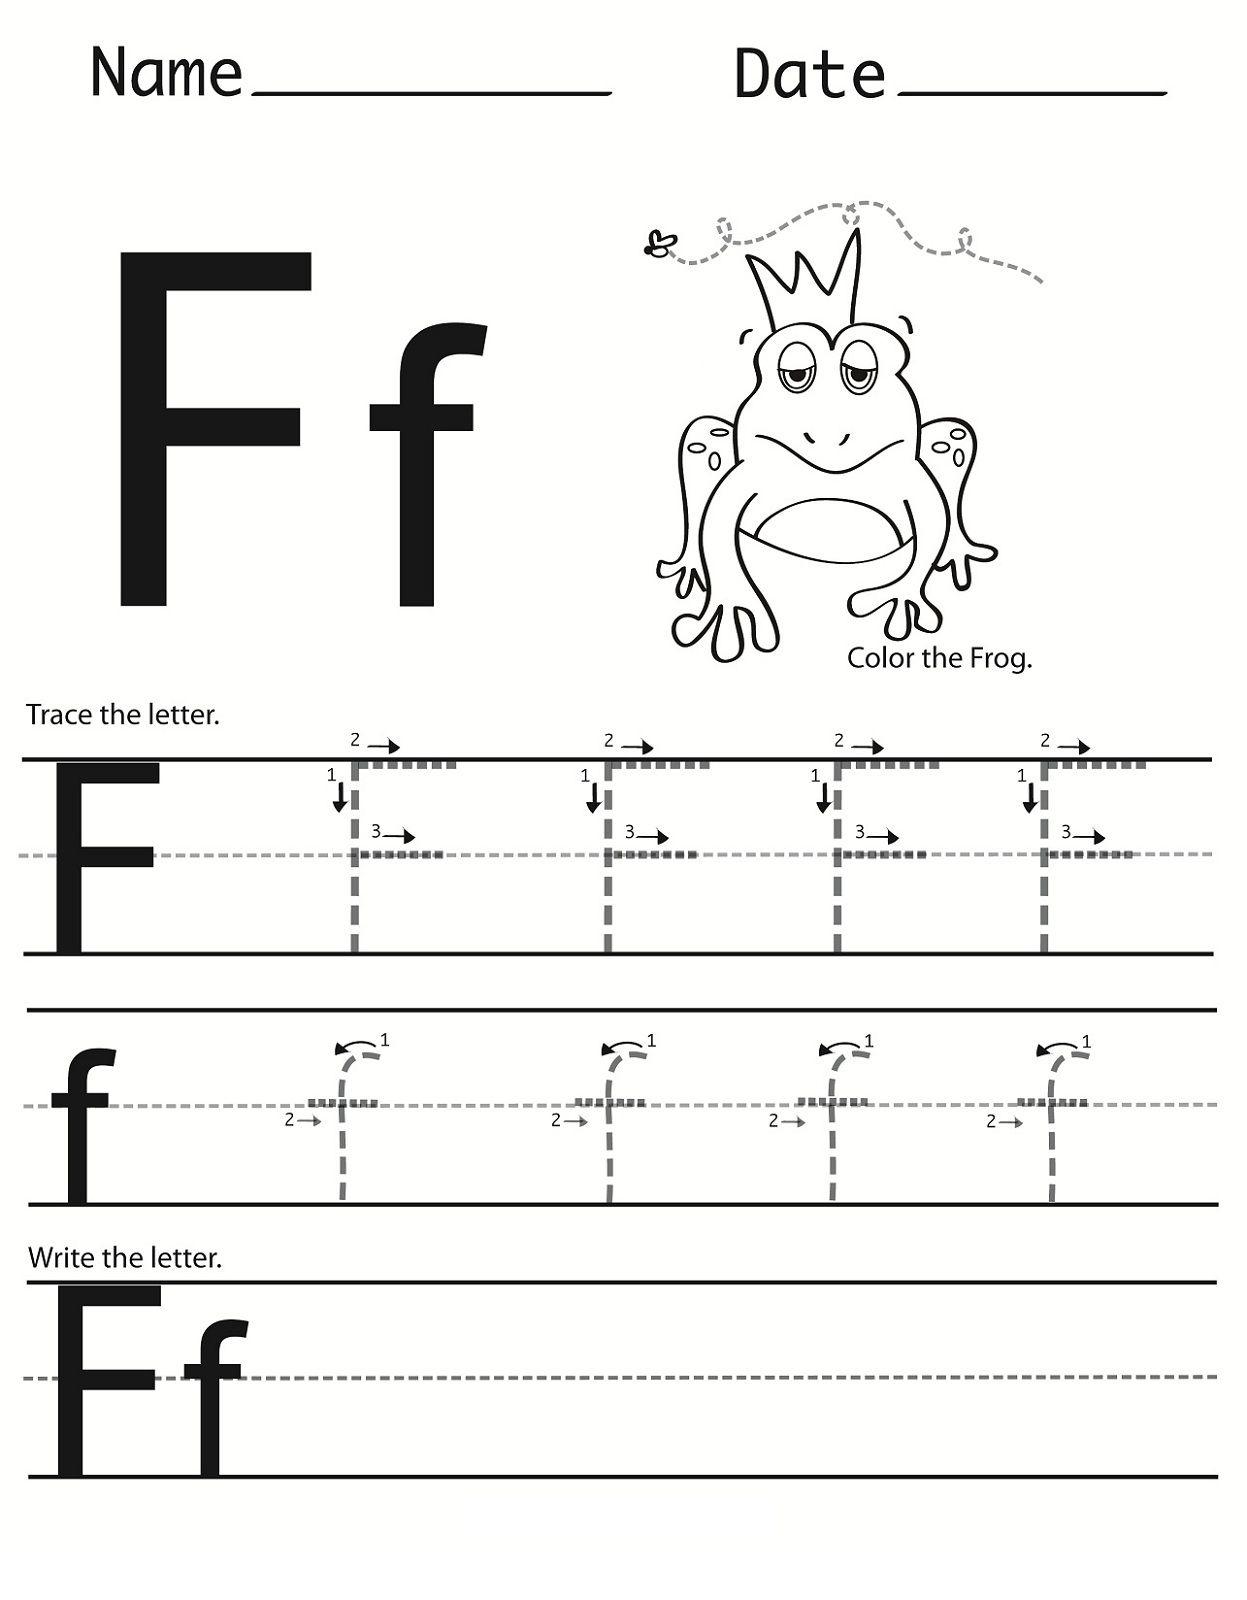 Letter F Worksheet For Preschool And Kindergarten inside F Letter Worksheets Preschool